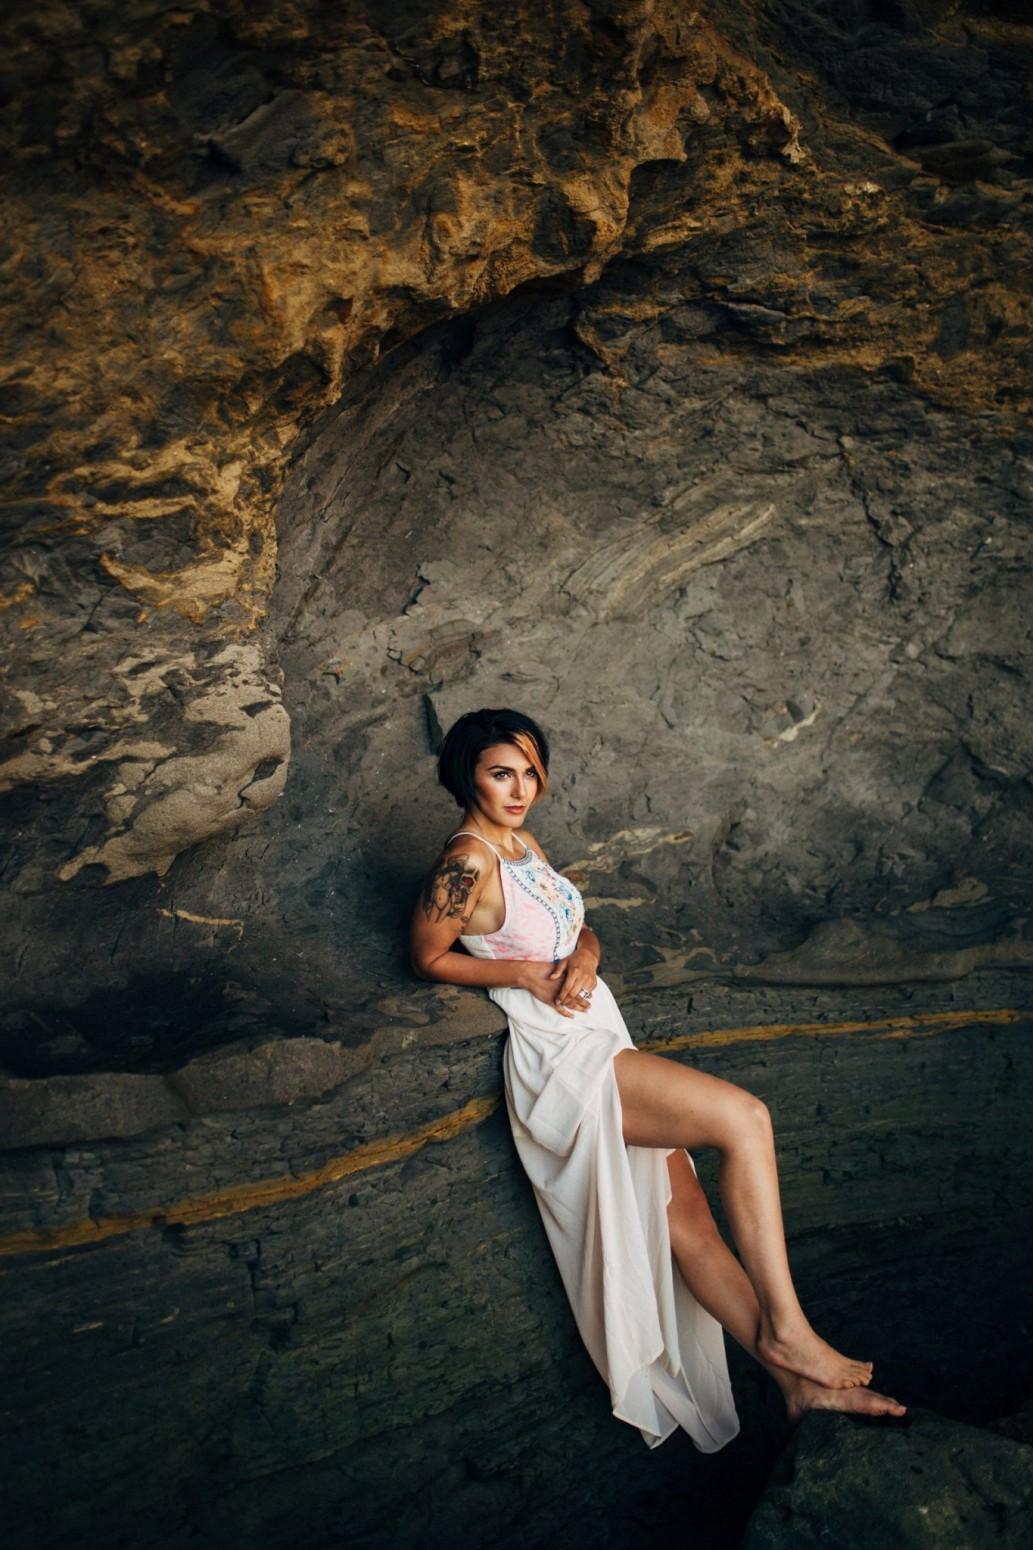 wild-native-photography-sandiego-destination-photographer-pittsburgh-sunset-cliffs_0251